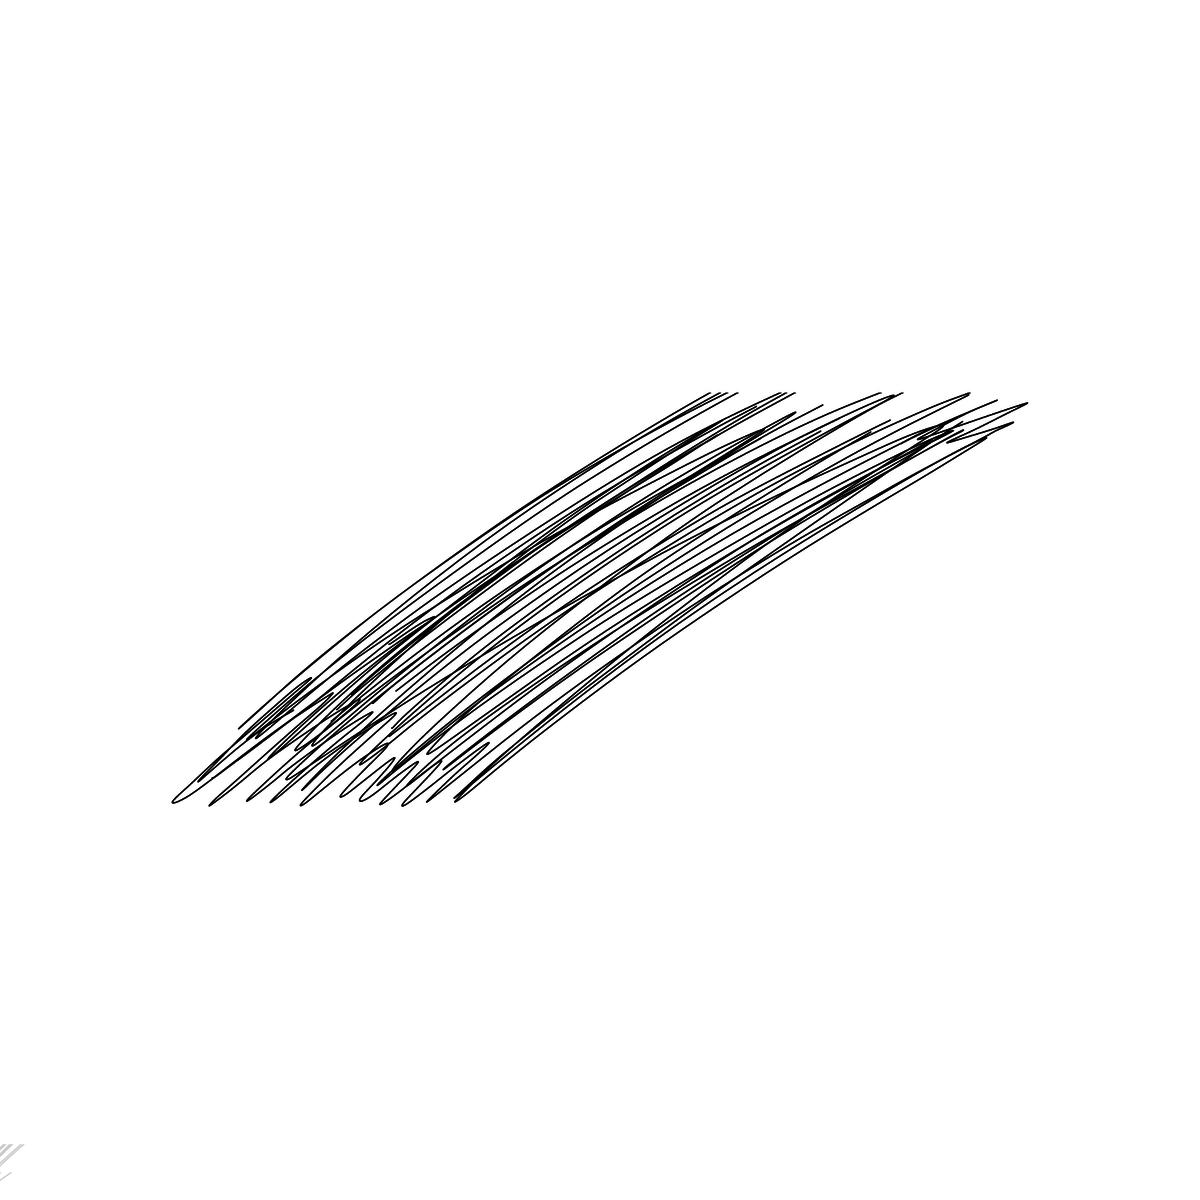 BAAAM drawing#9003 lat:60.4561843872070300lng: 22.2537517547607420